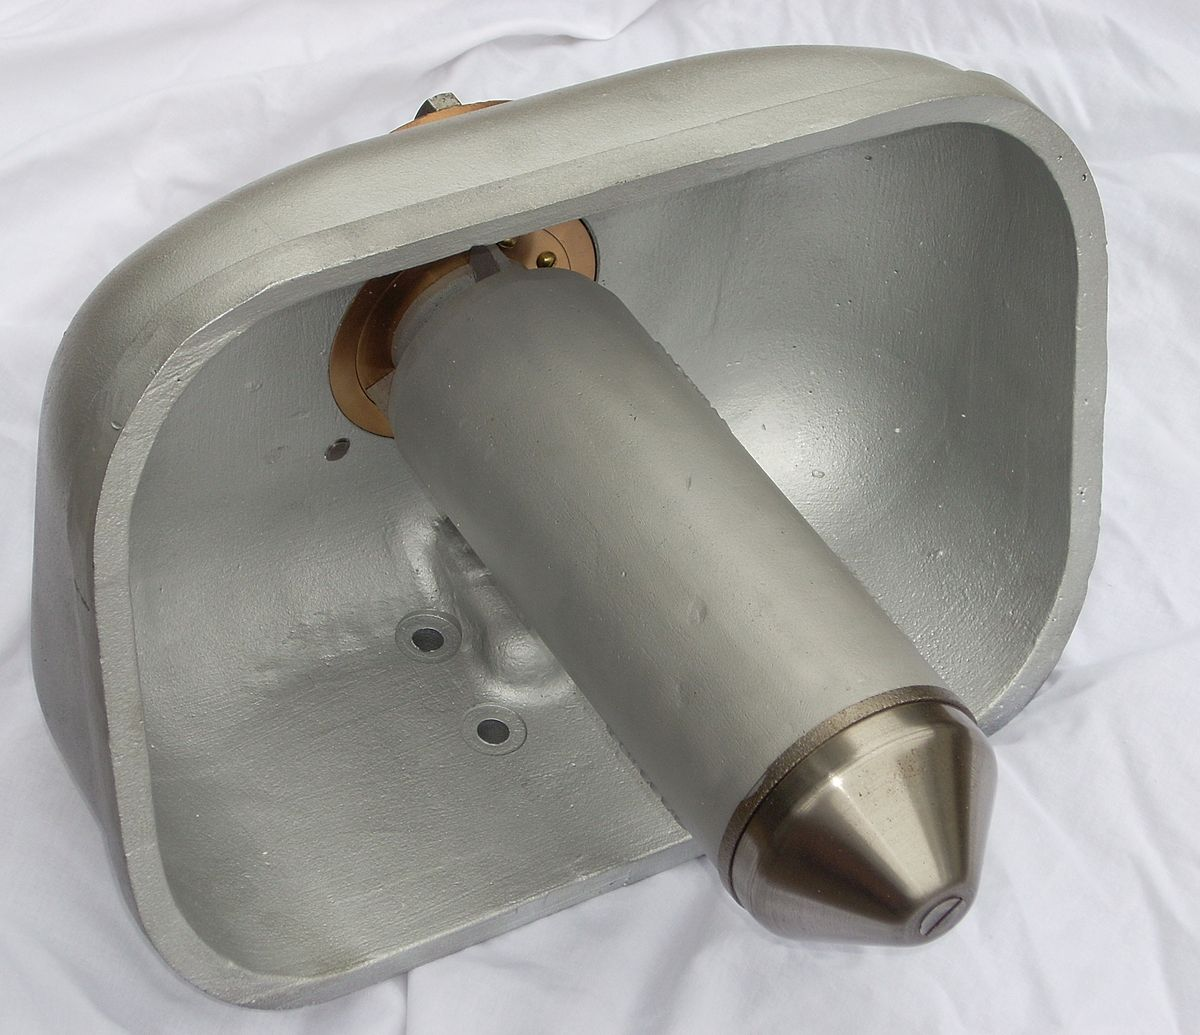 Hancock Air Whistle Wikipedia